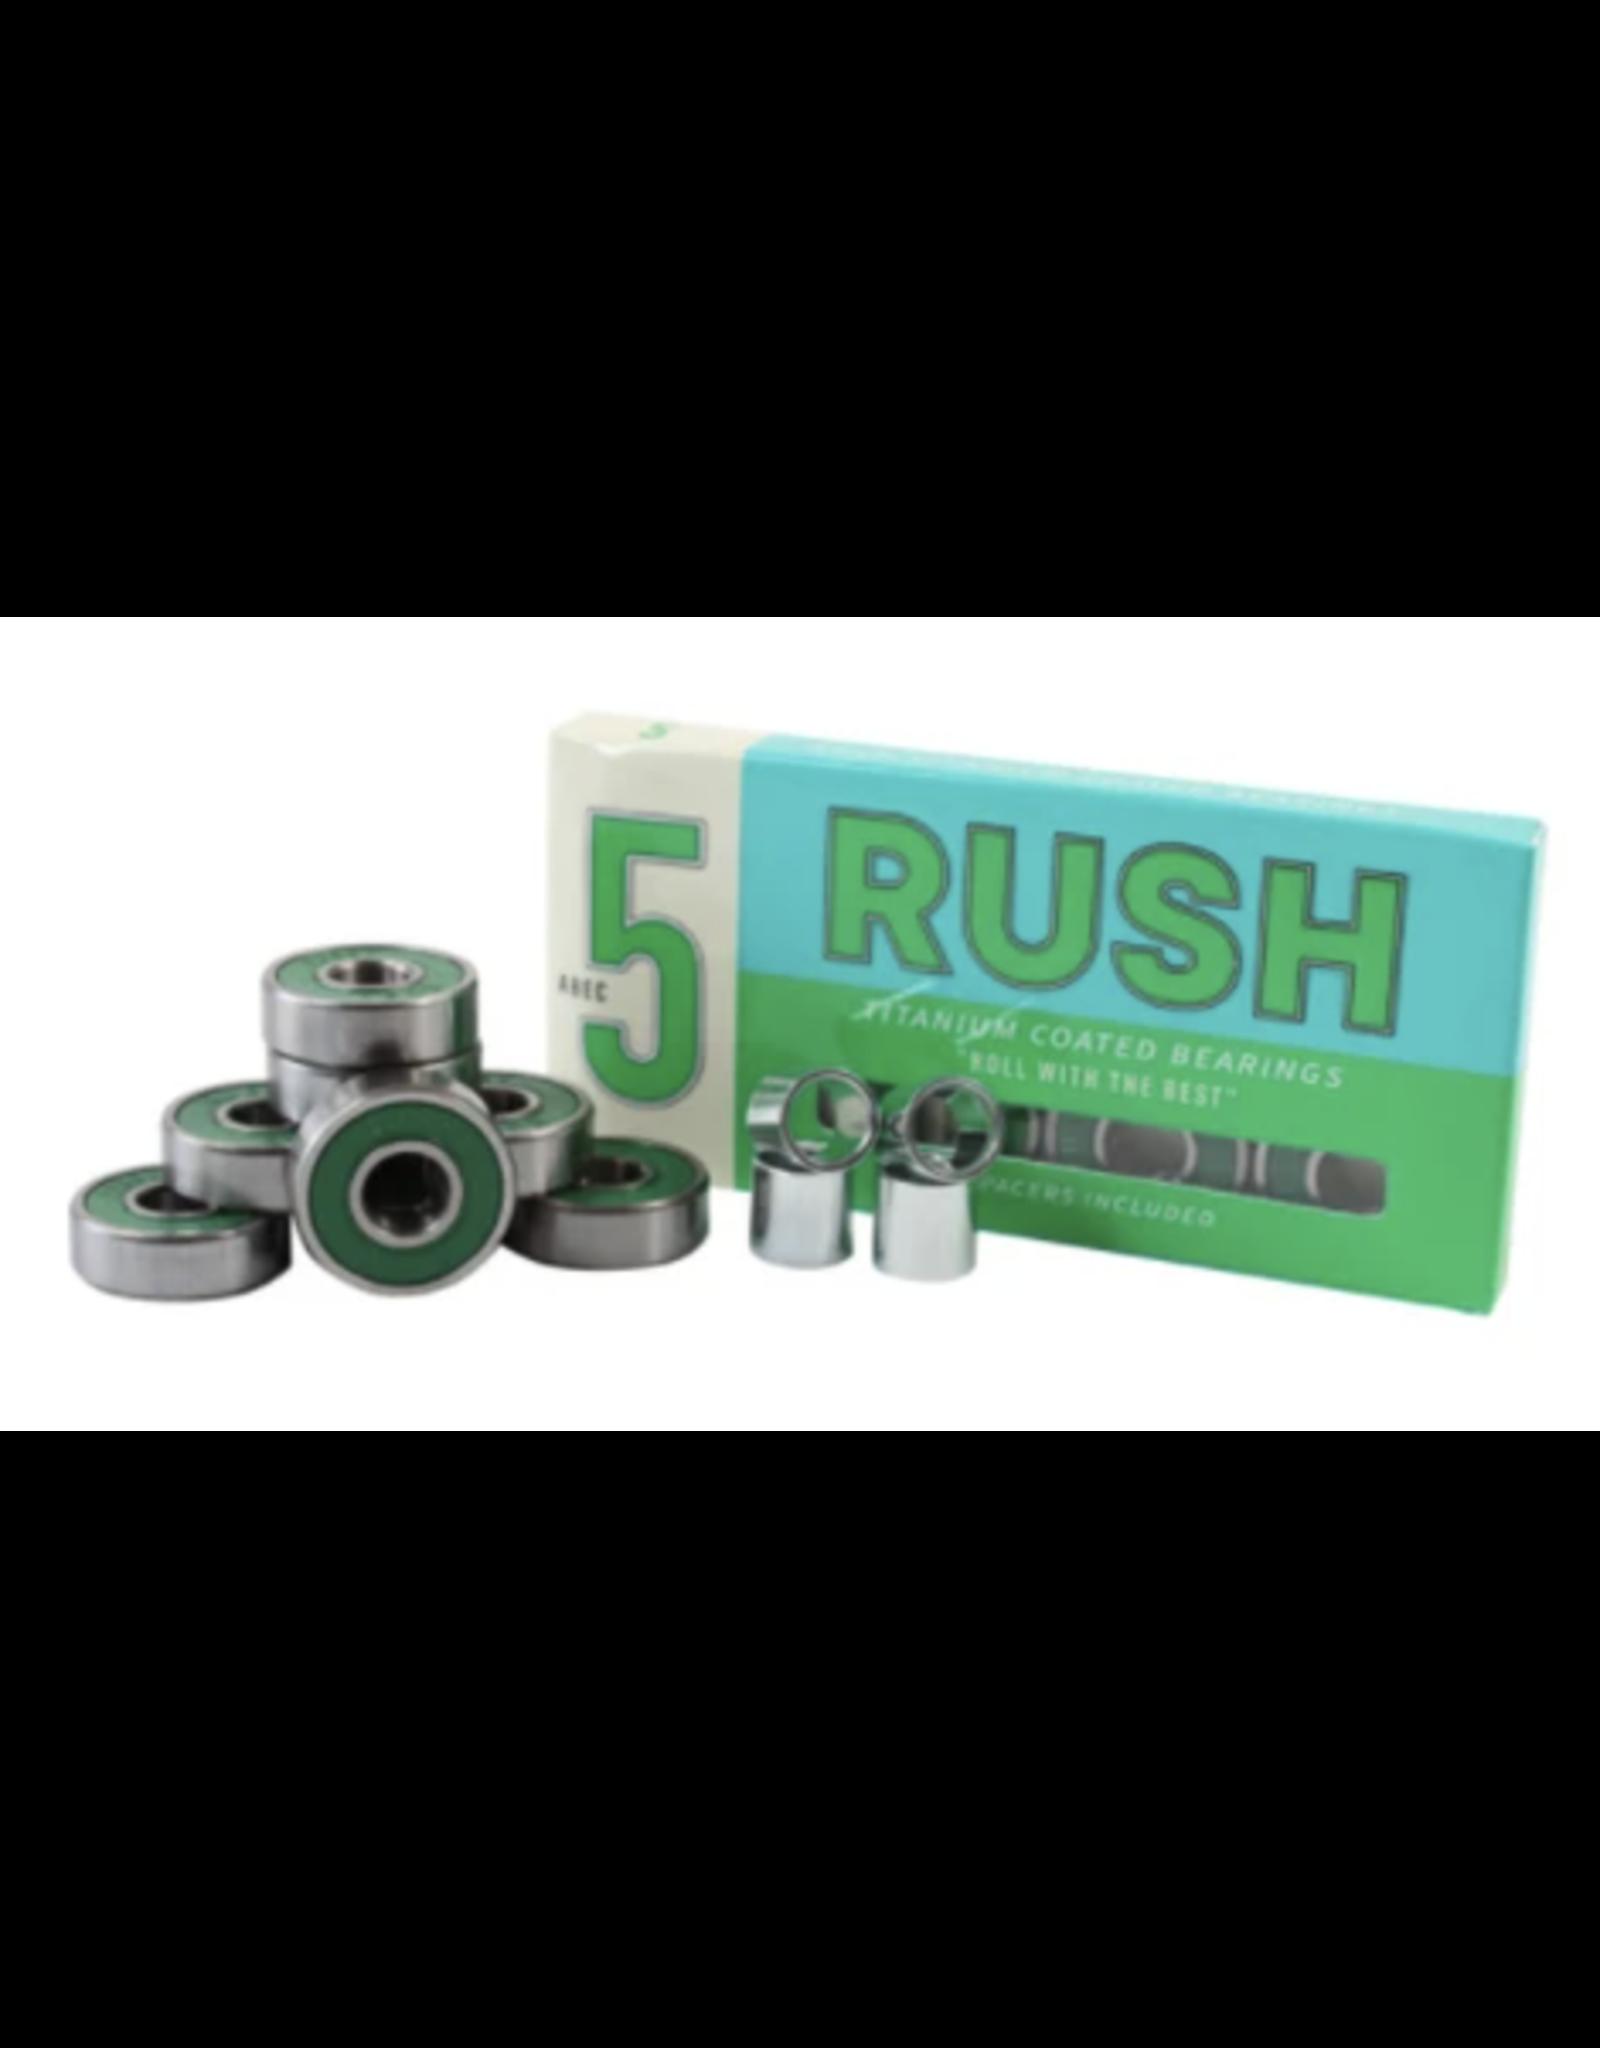 Rush Abec 5 Titanium Coated Bearings